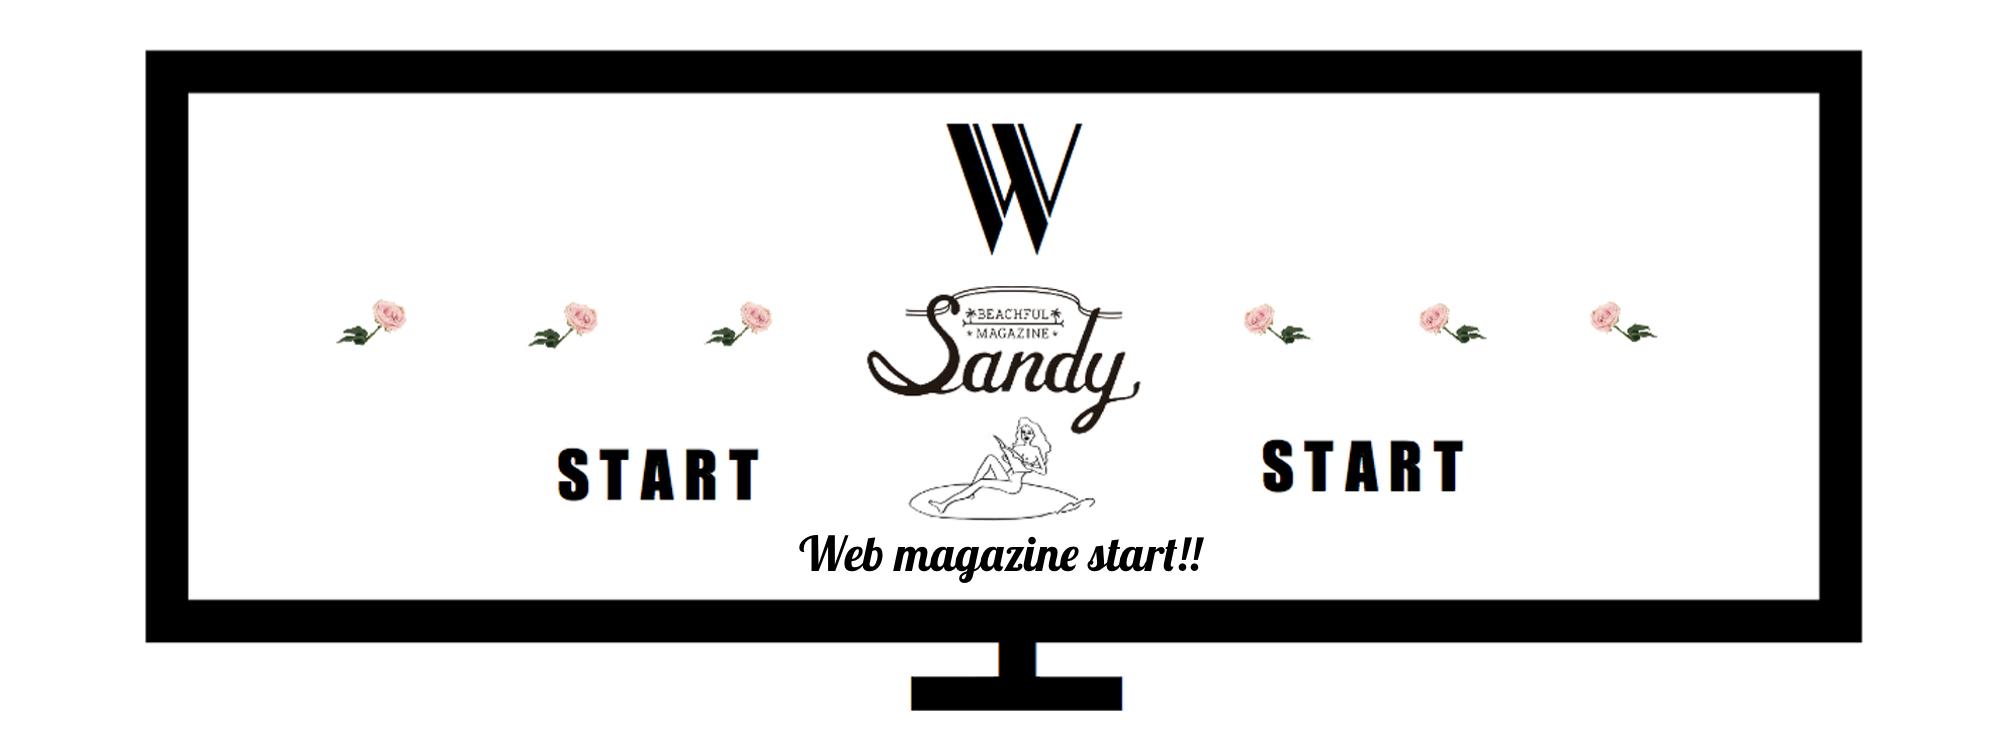 Sandy magazine